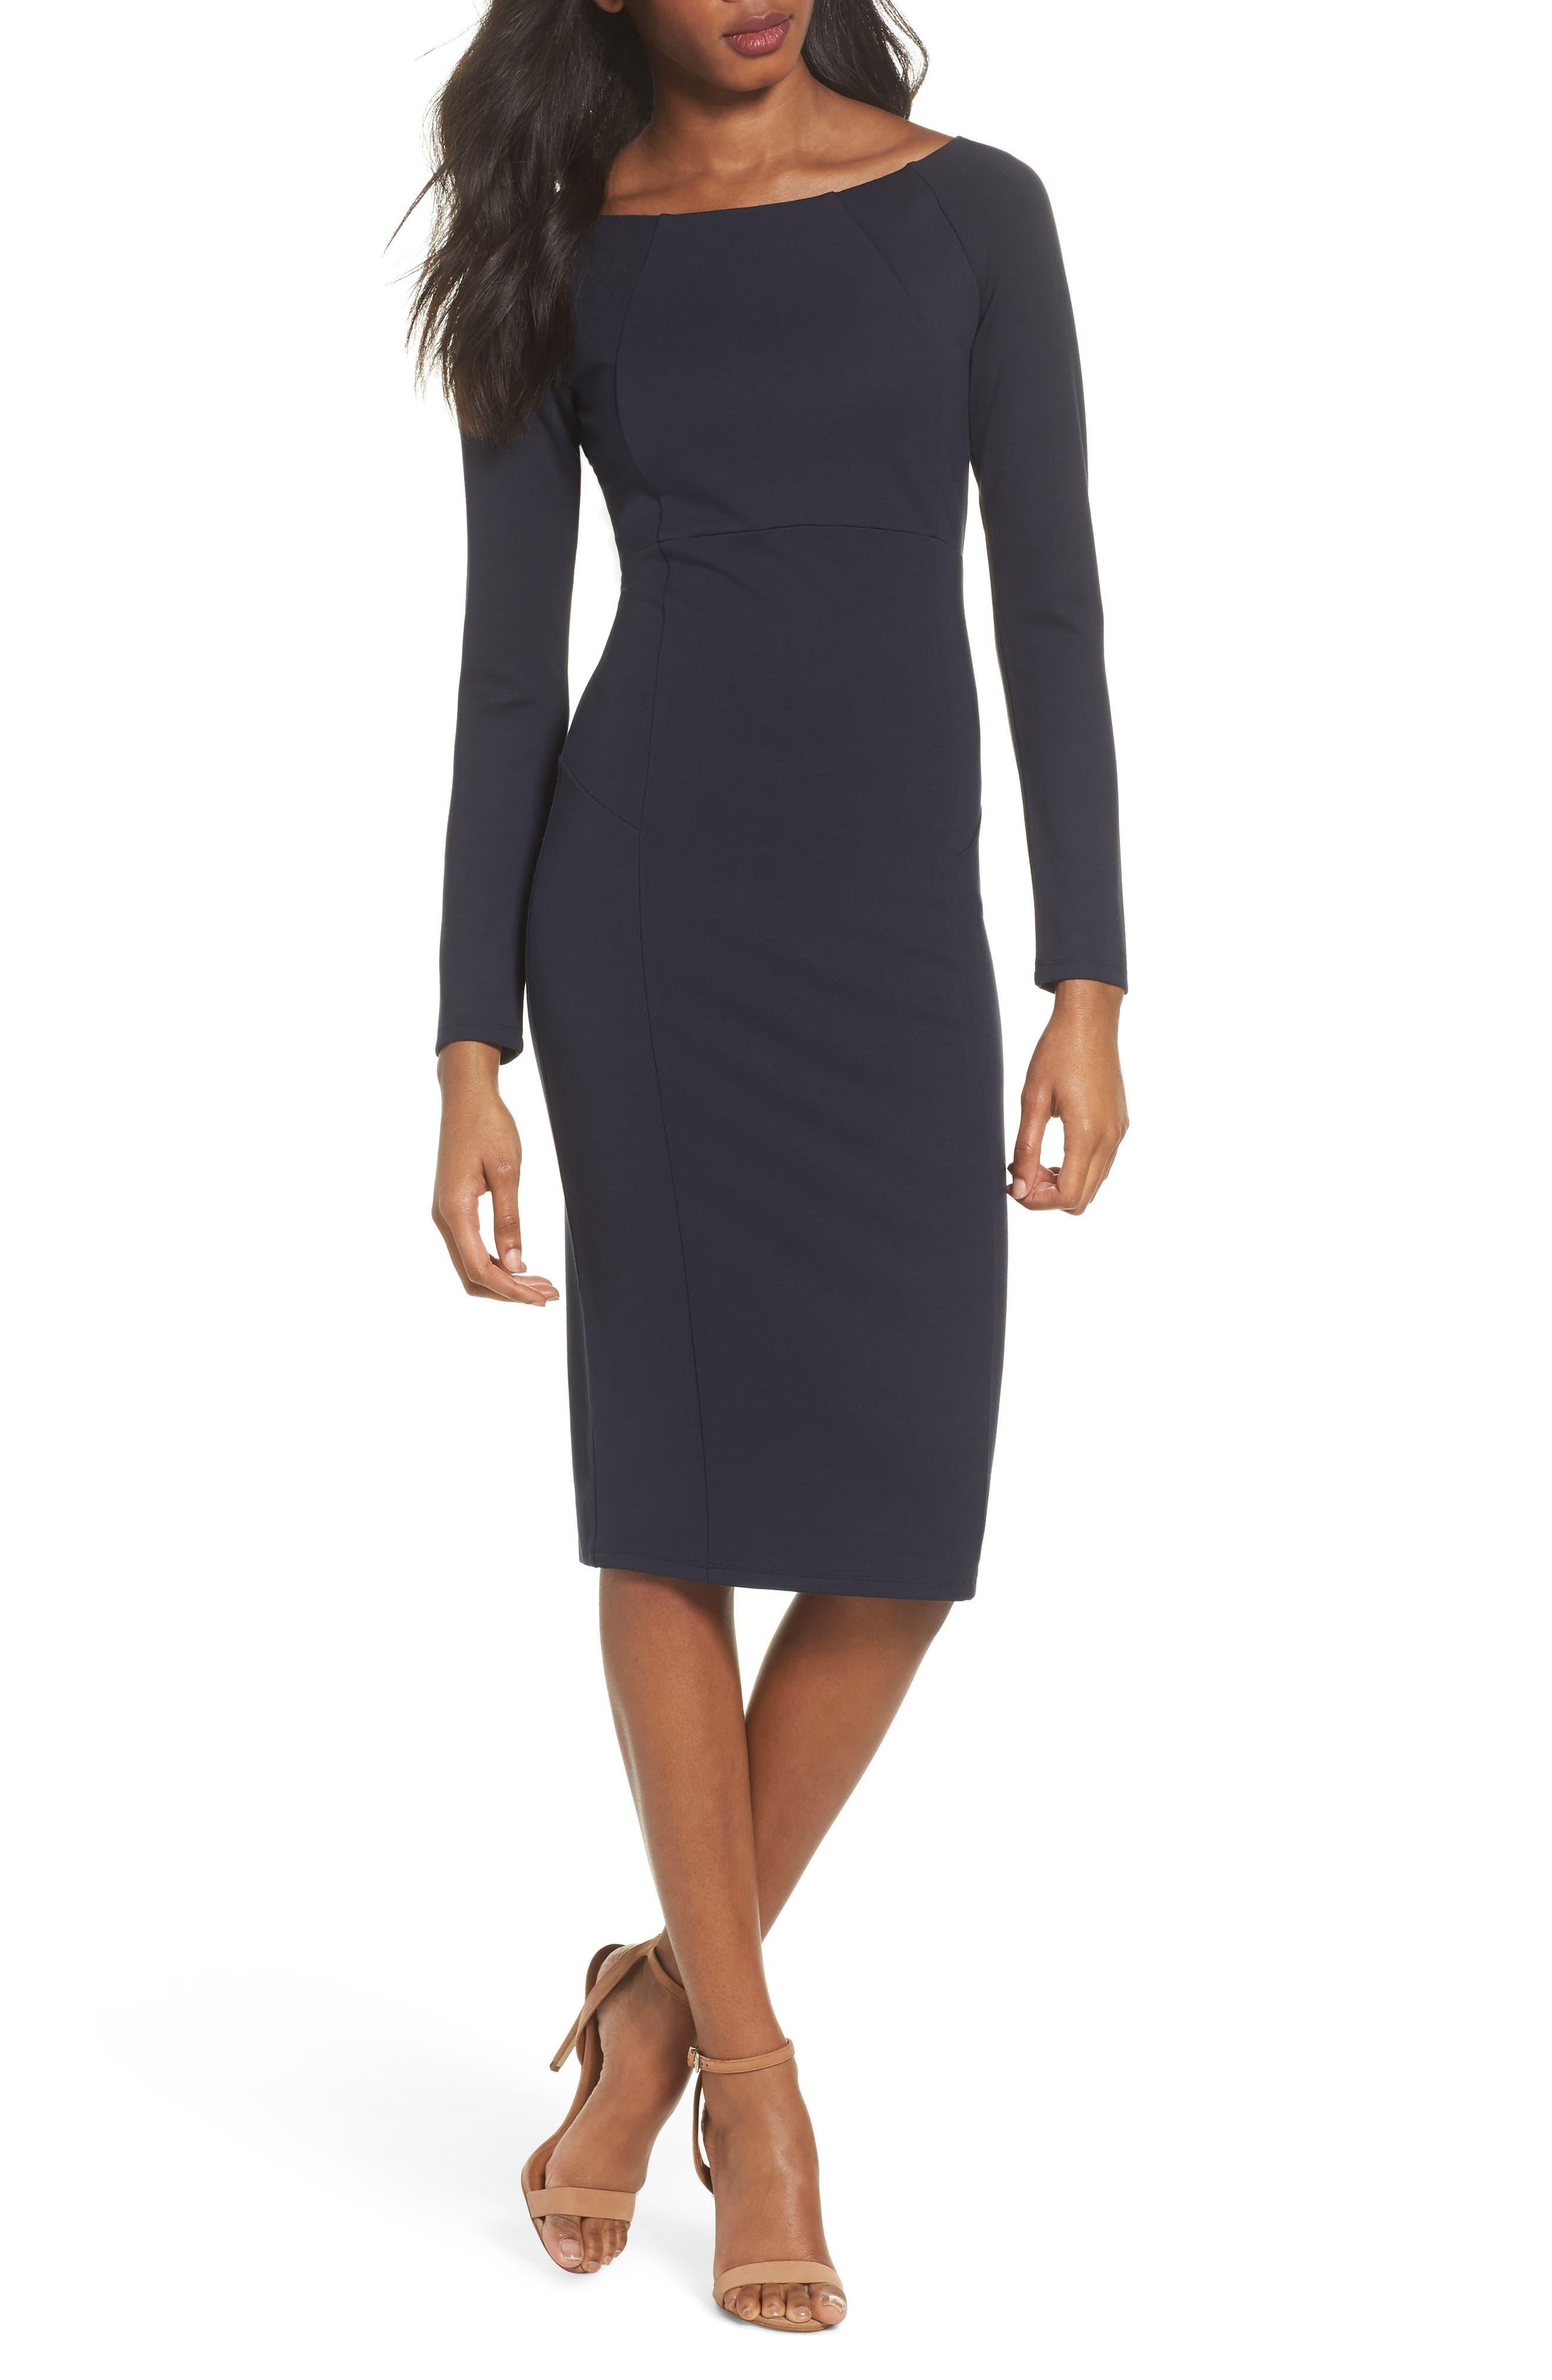 Maile Sheath Dress,                             Main thumbnail 1, color,                             400